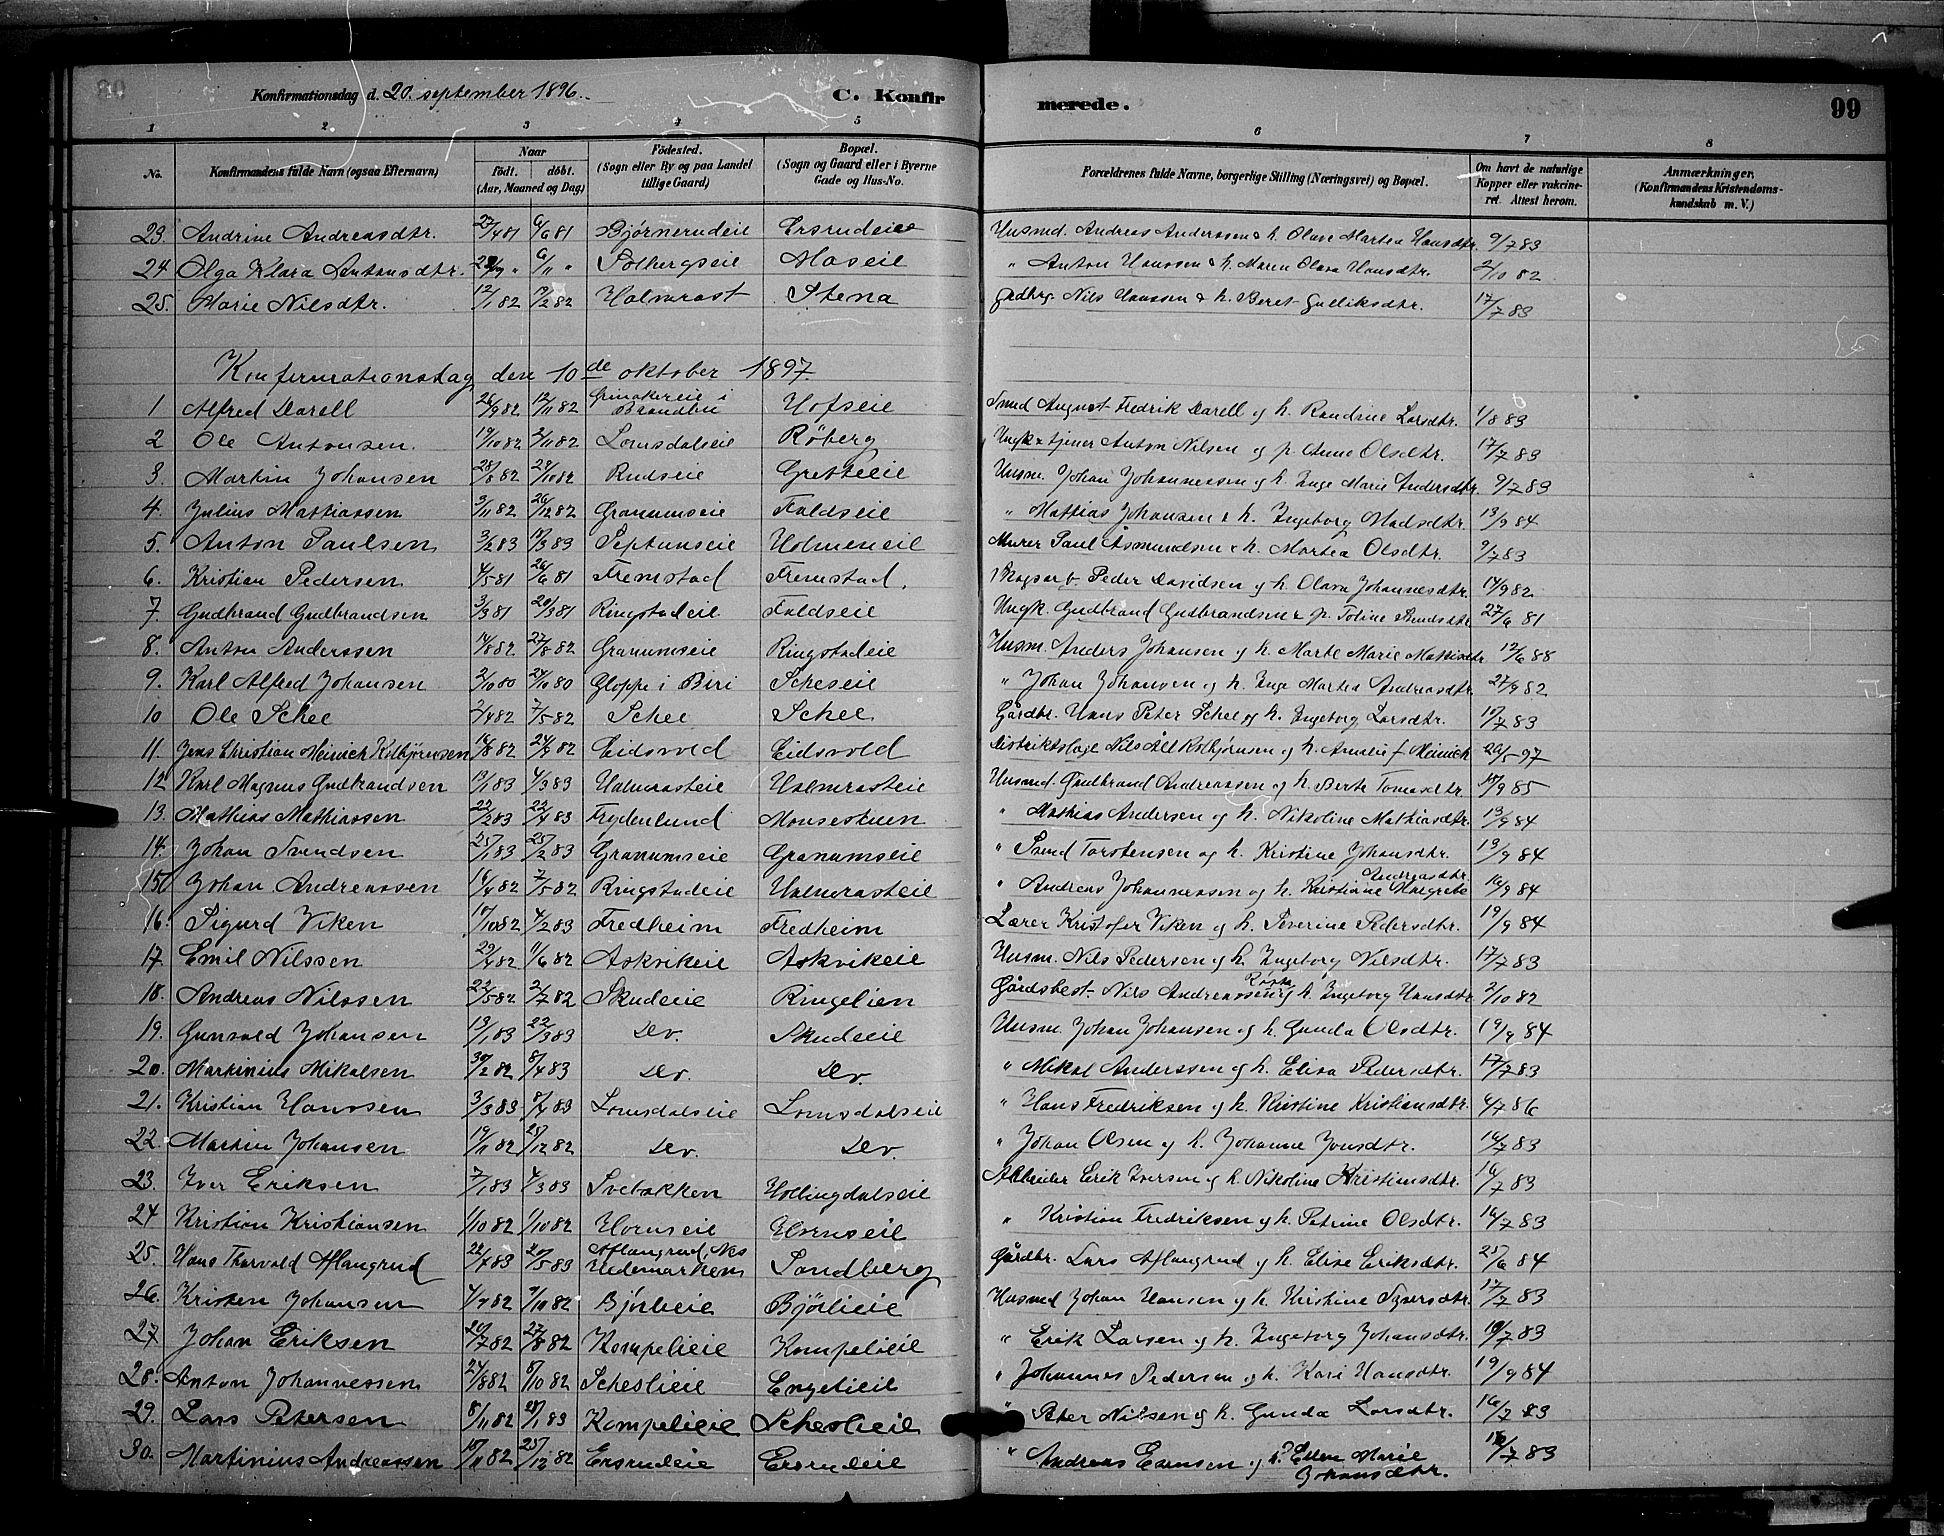 SAH, Søndre Land prestekontor, L/L0002: Klokkerbok nr. 2, 1884-1900, s. 99